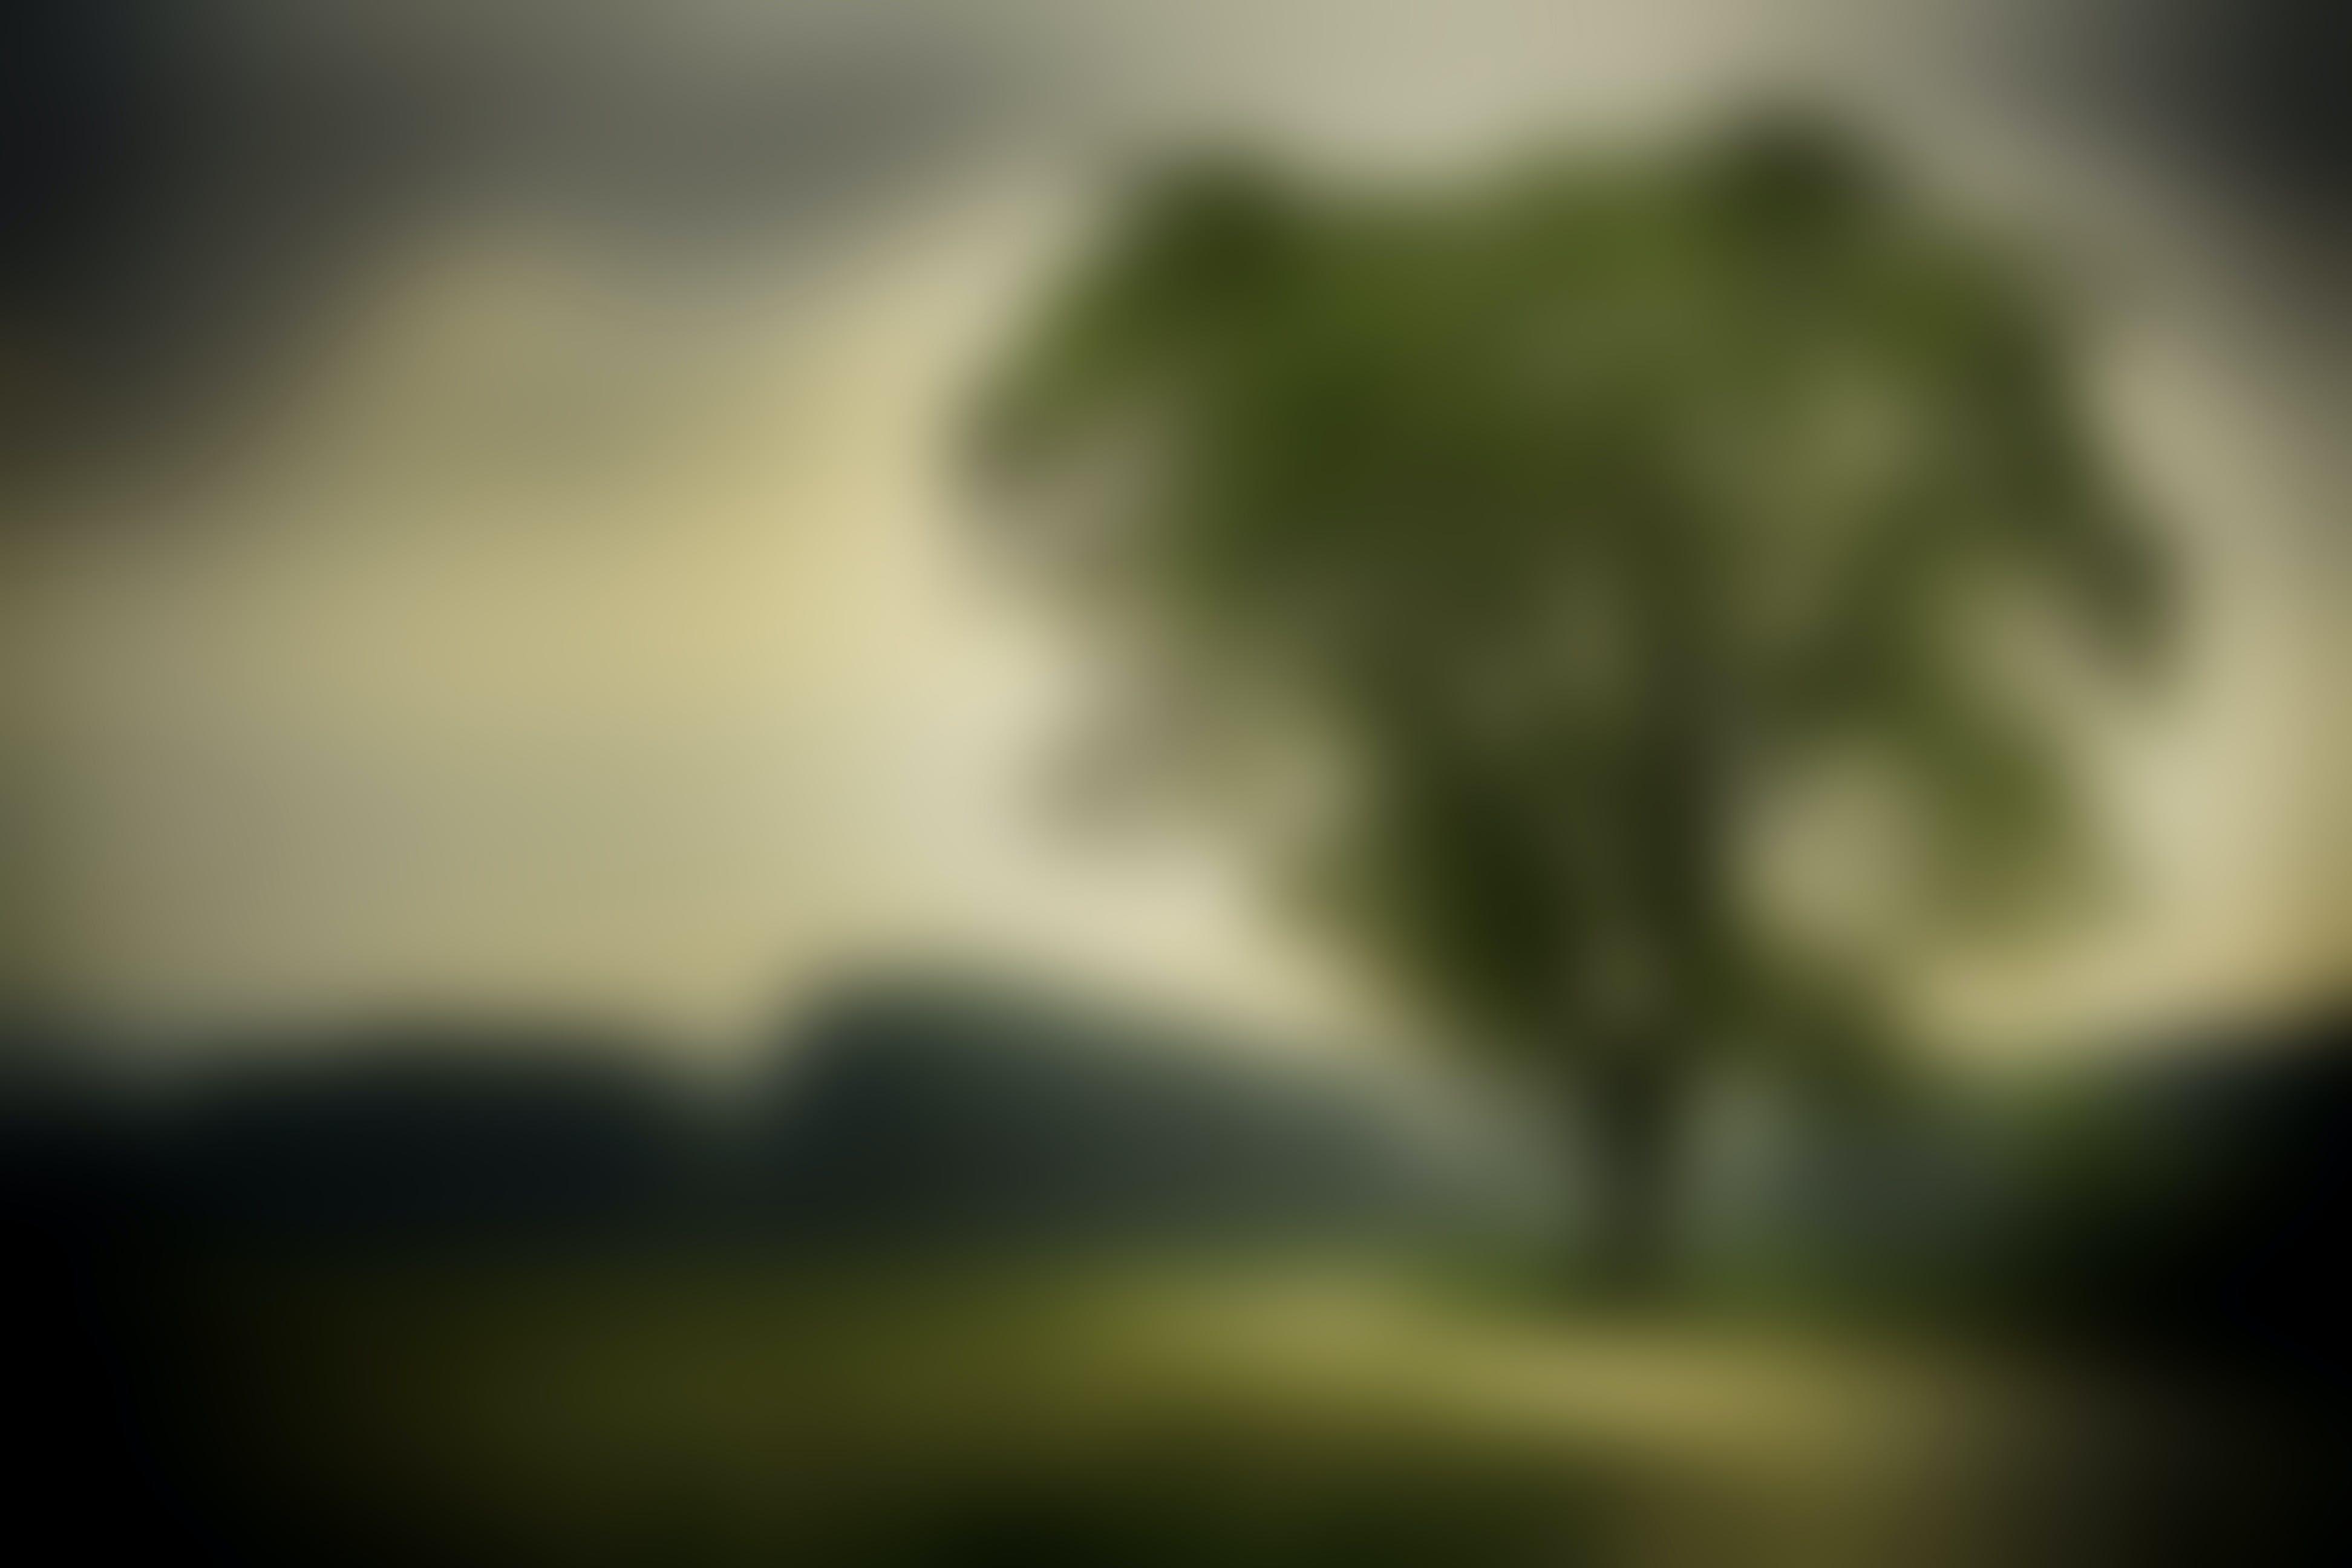 Free stock photo of nature, blur, tree, green